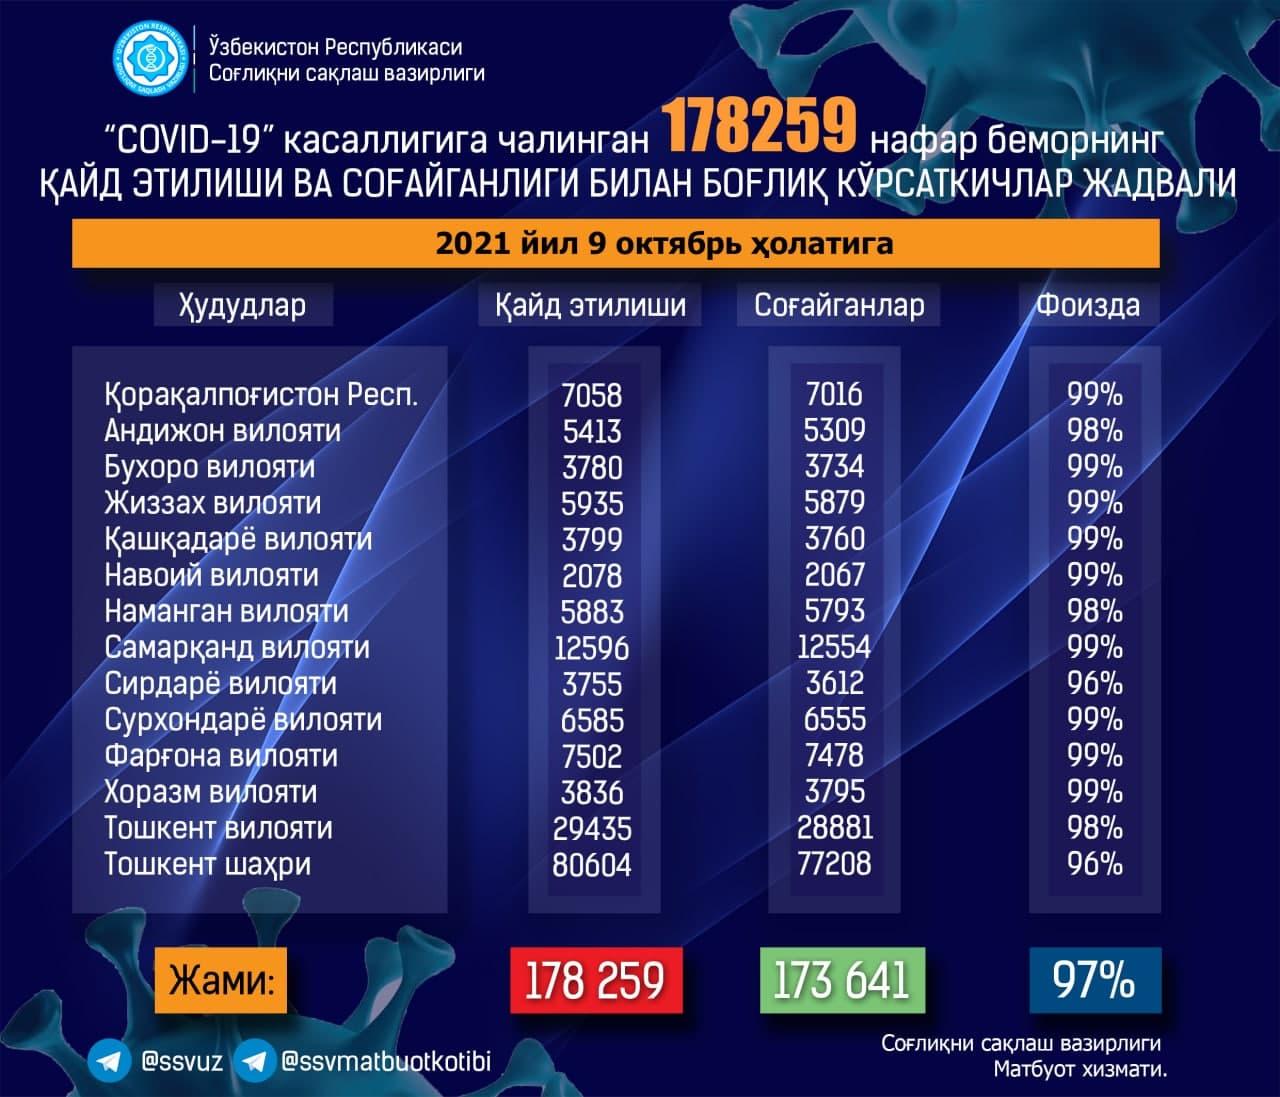 За сутки по Узбекистану обнаружили свыше 400 новых случаев коронавируса — статистика